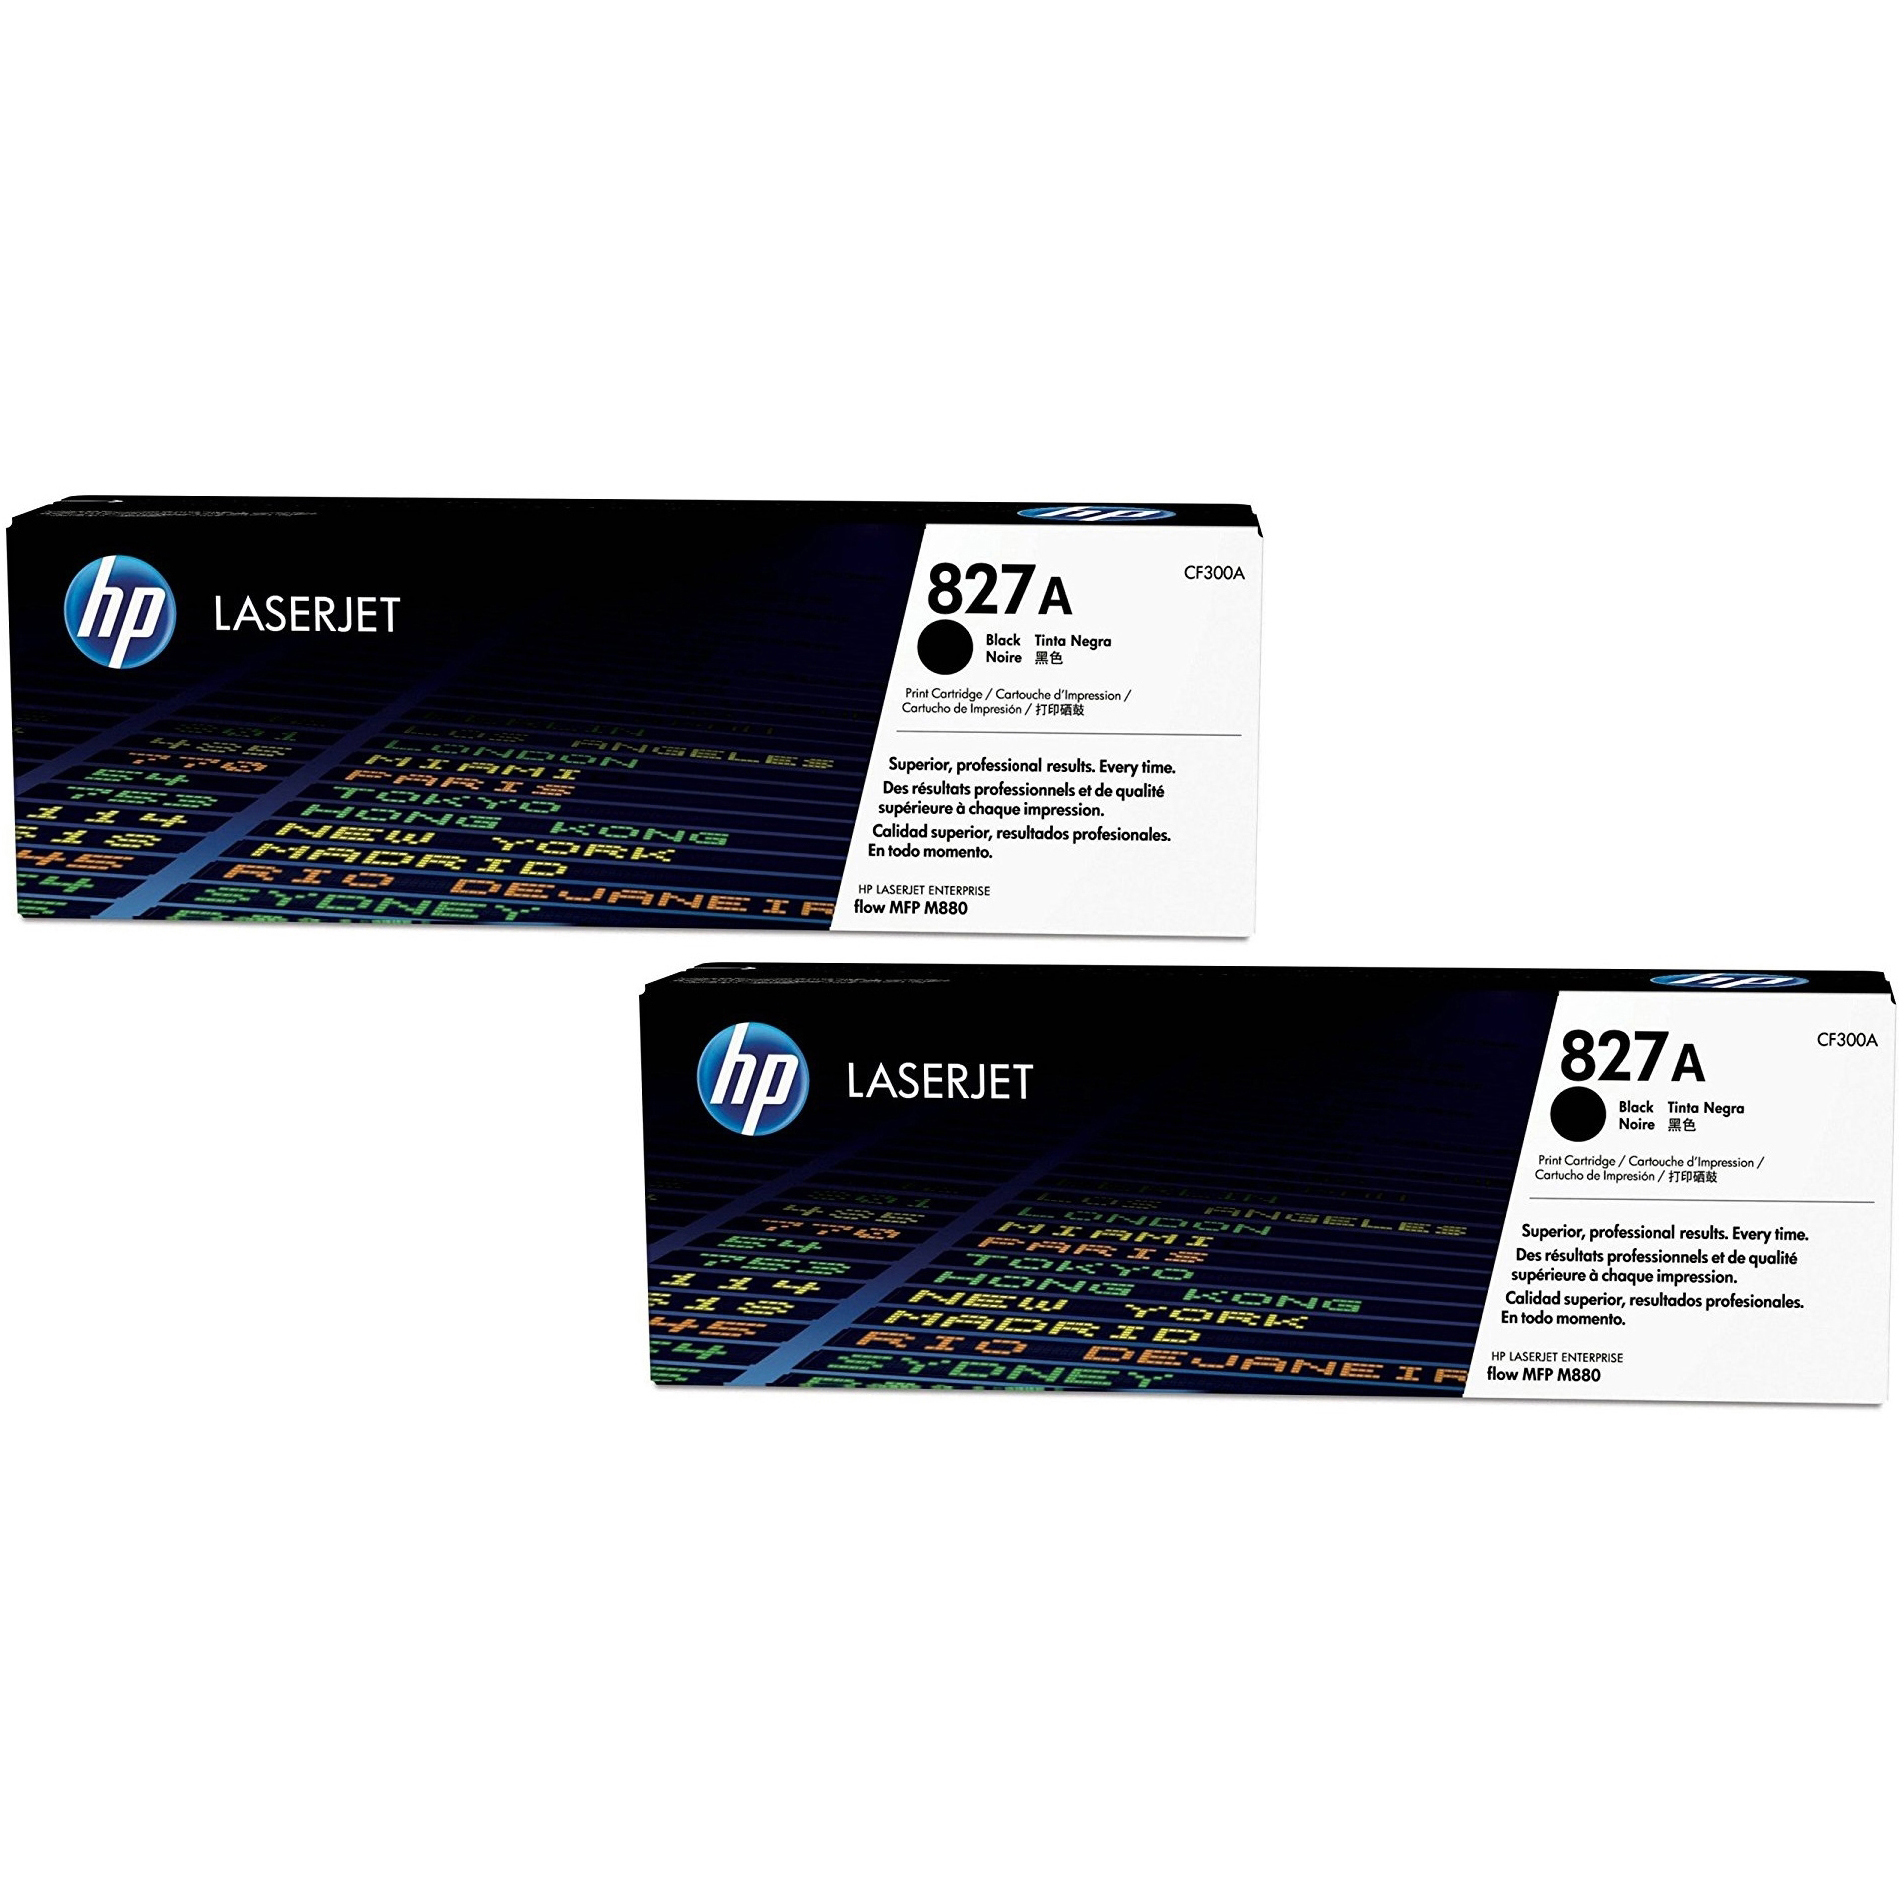 Original HP 827A Black Twin Pack Toner Cartridges (CF300A)